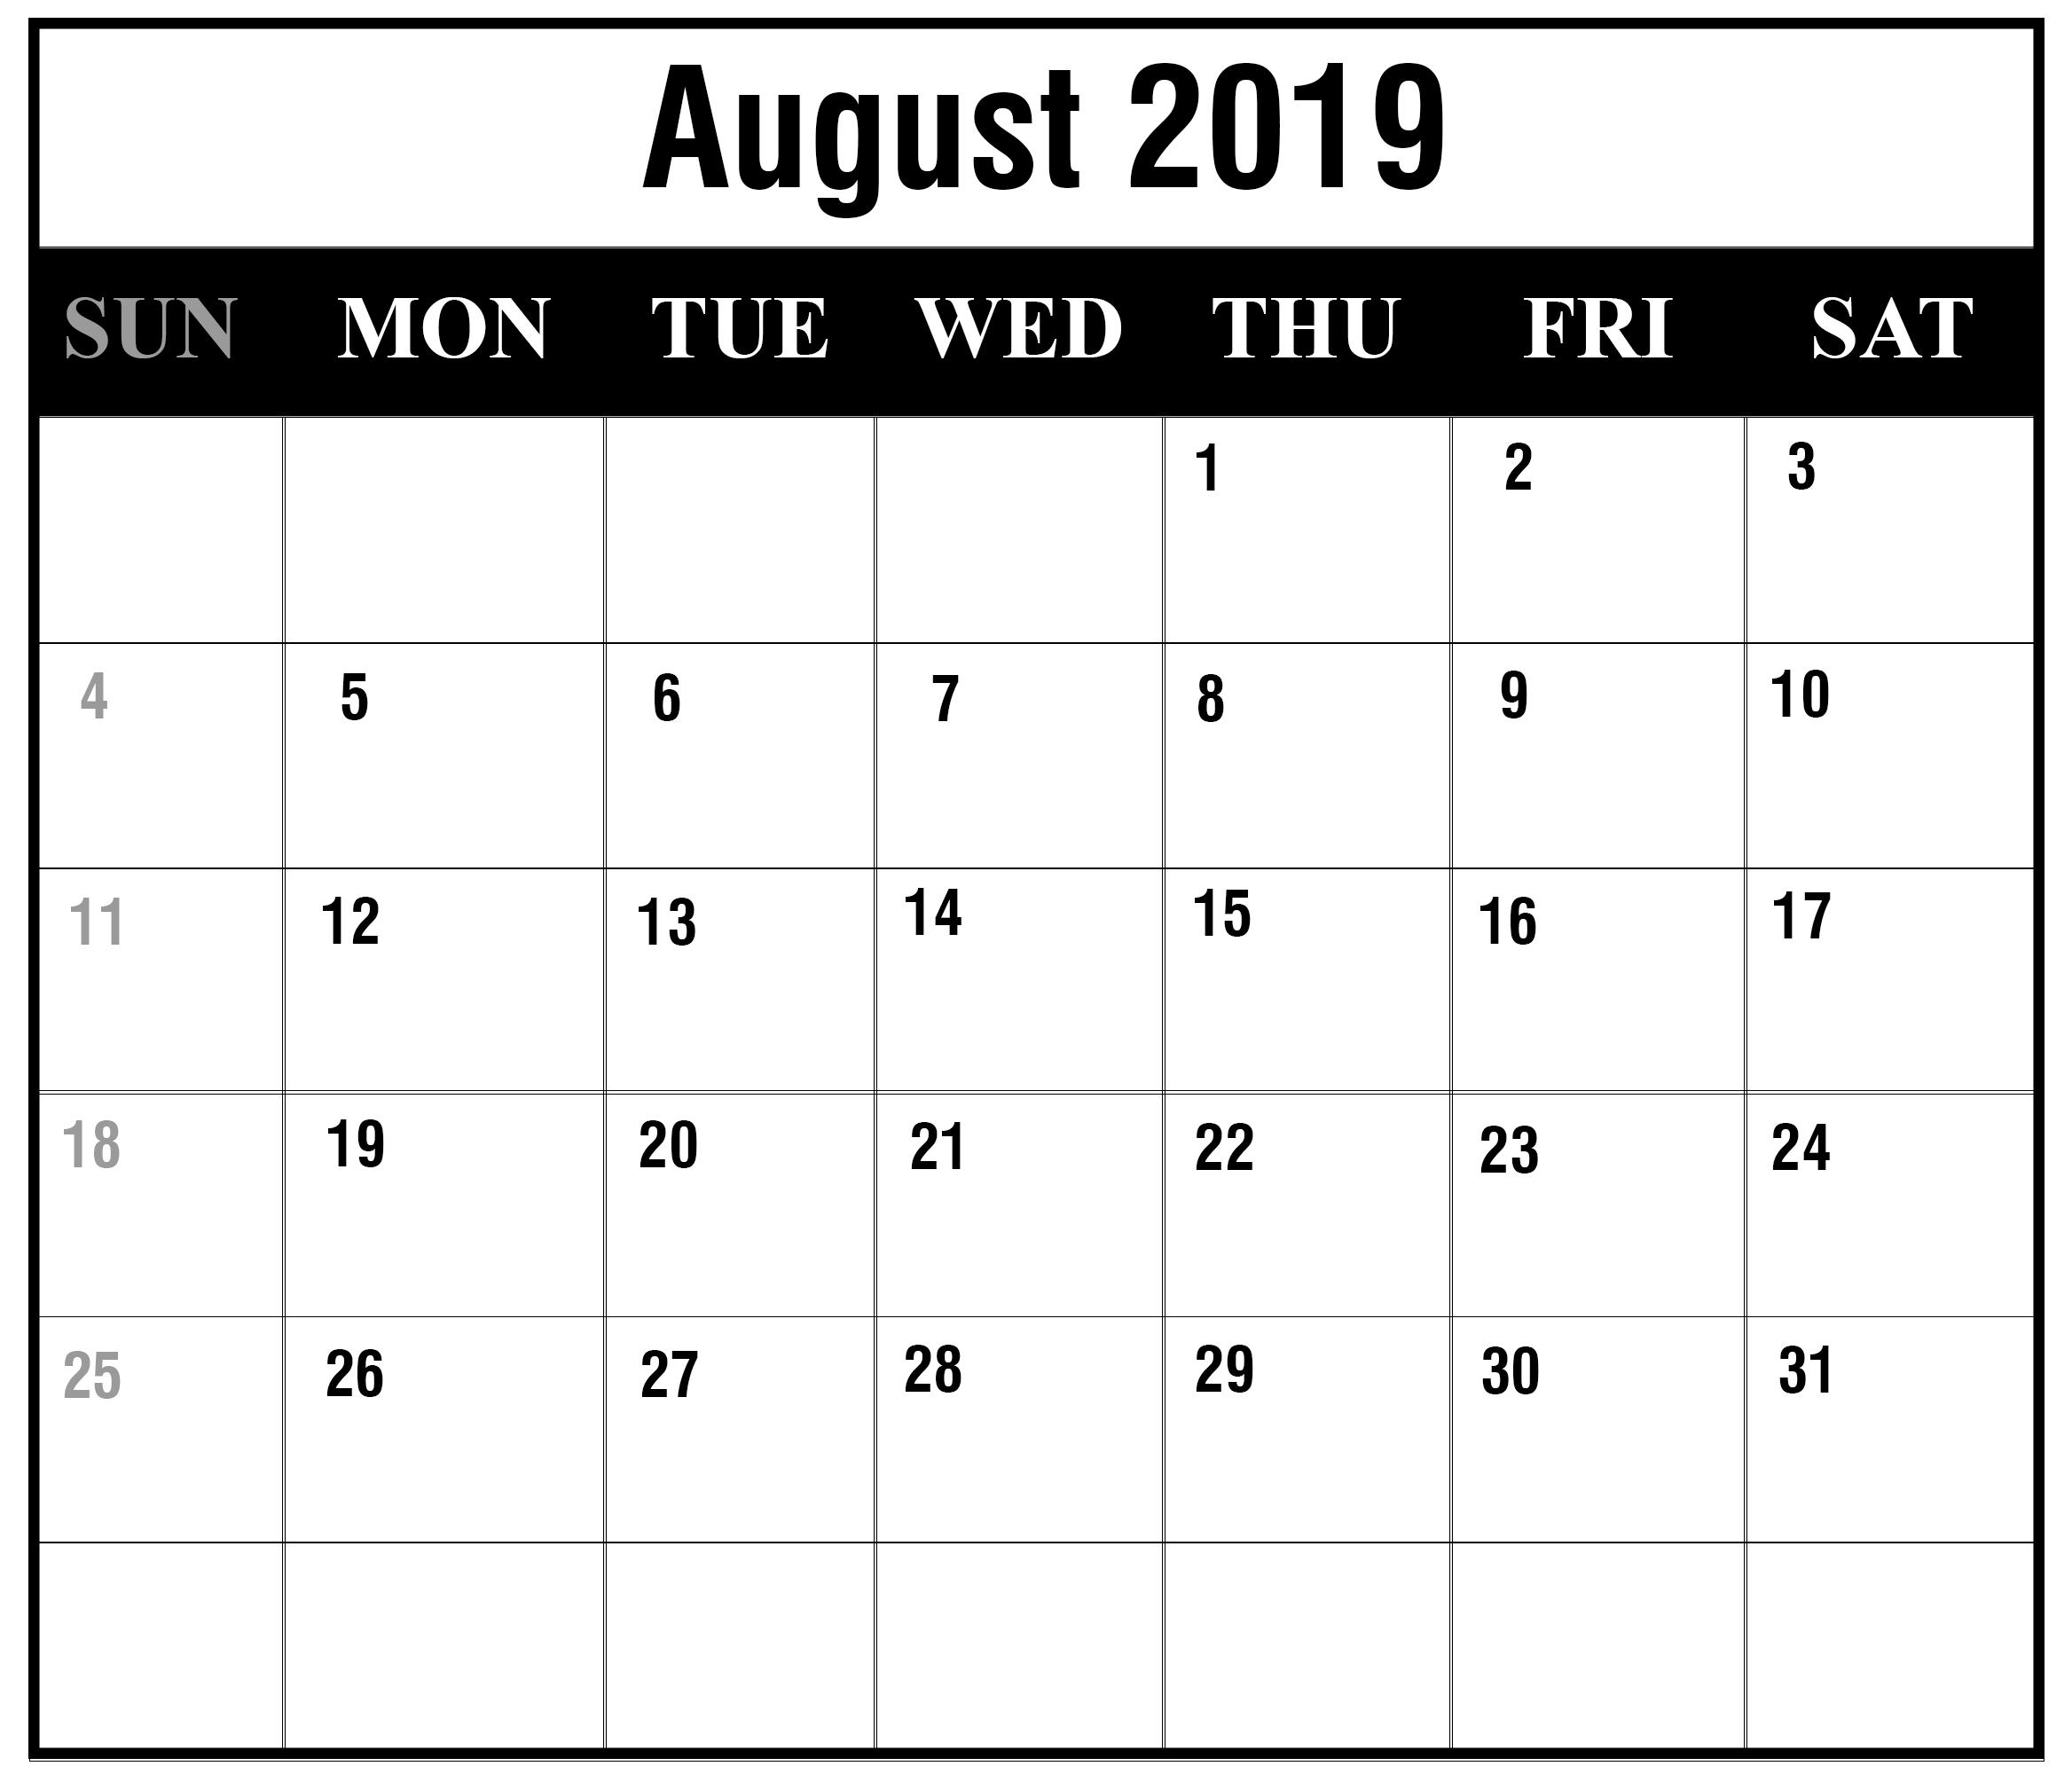 Free August 2019 Printable Calendar Template In Pdf, Excel, Word inside August Calendar Template Excel